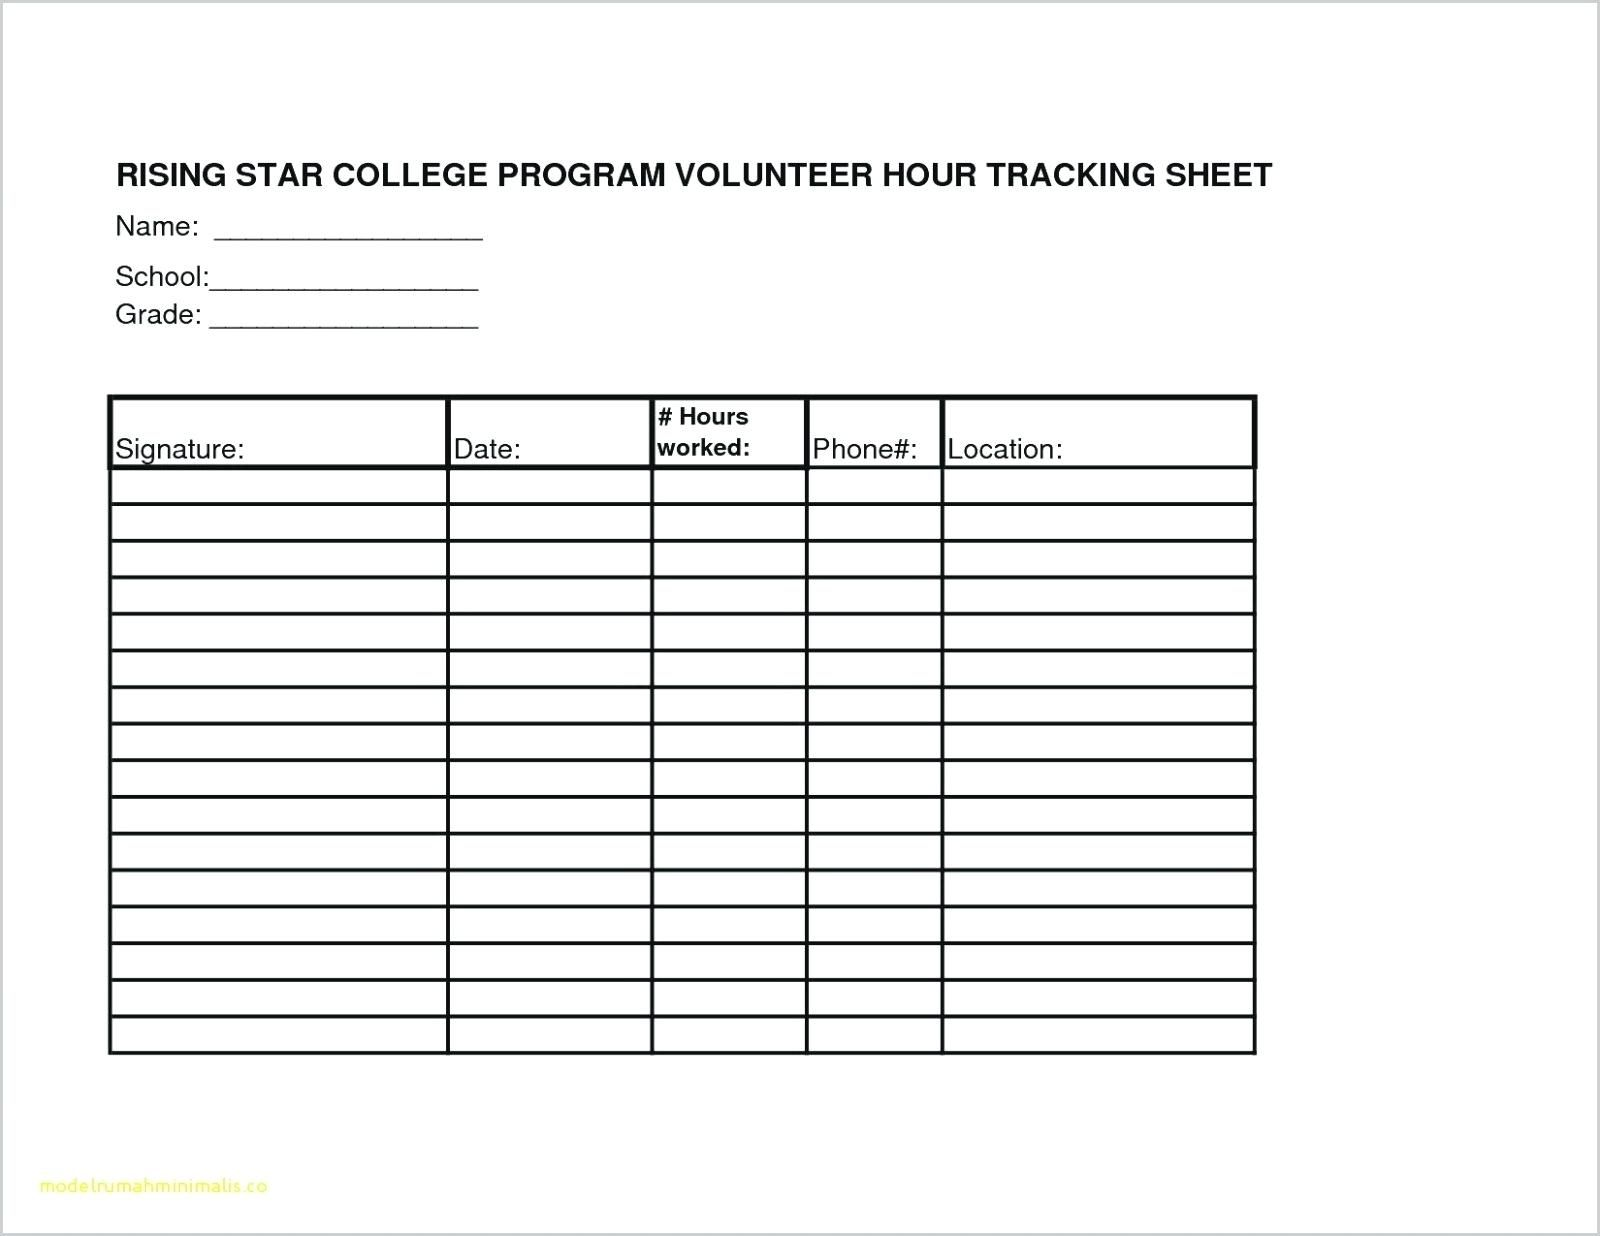 025 Volunteer Sign Up Form Template Sheet Templates Ideas Regarding Community Service Template Wo Sign In Sheet Template Professional Templates Volunteer Hours